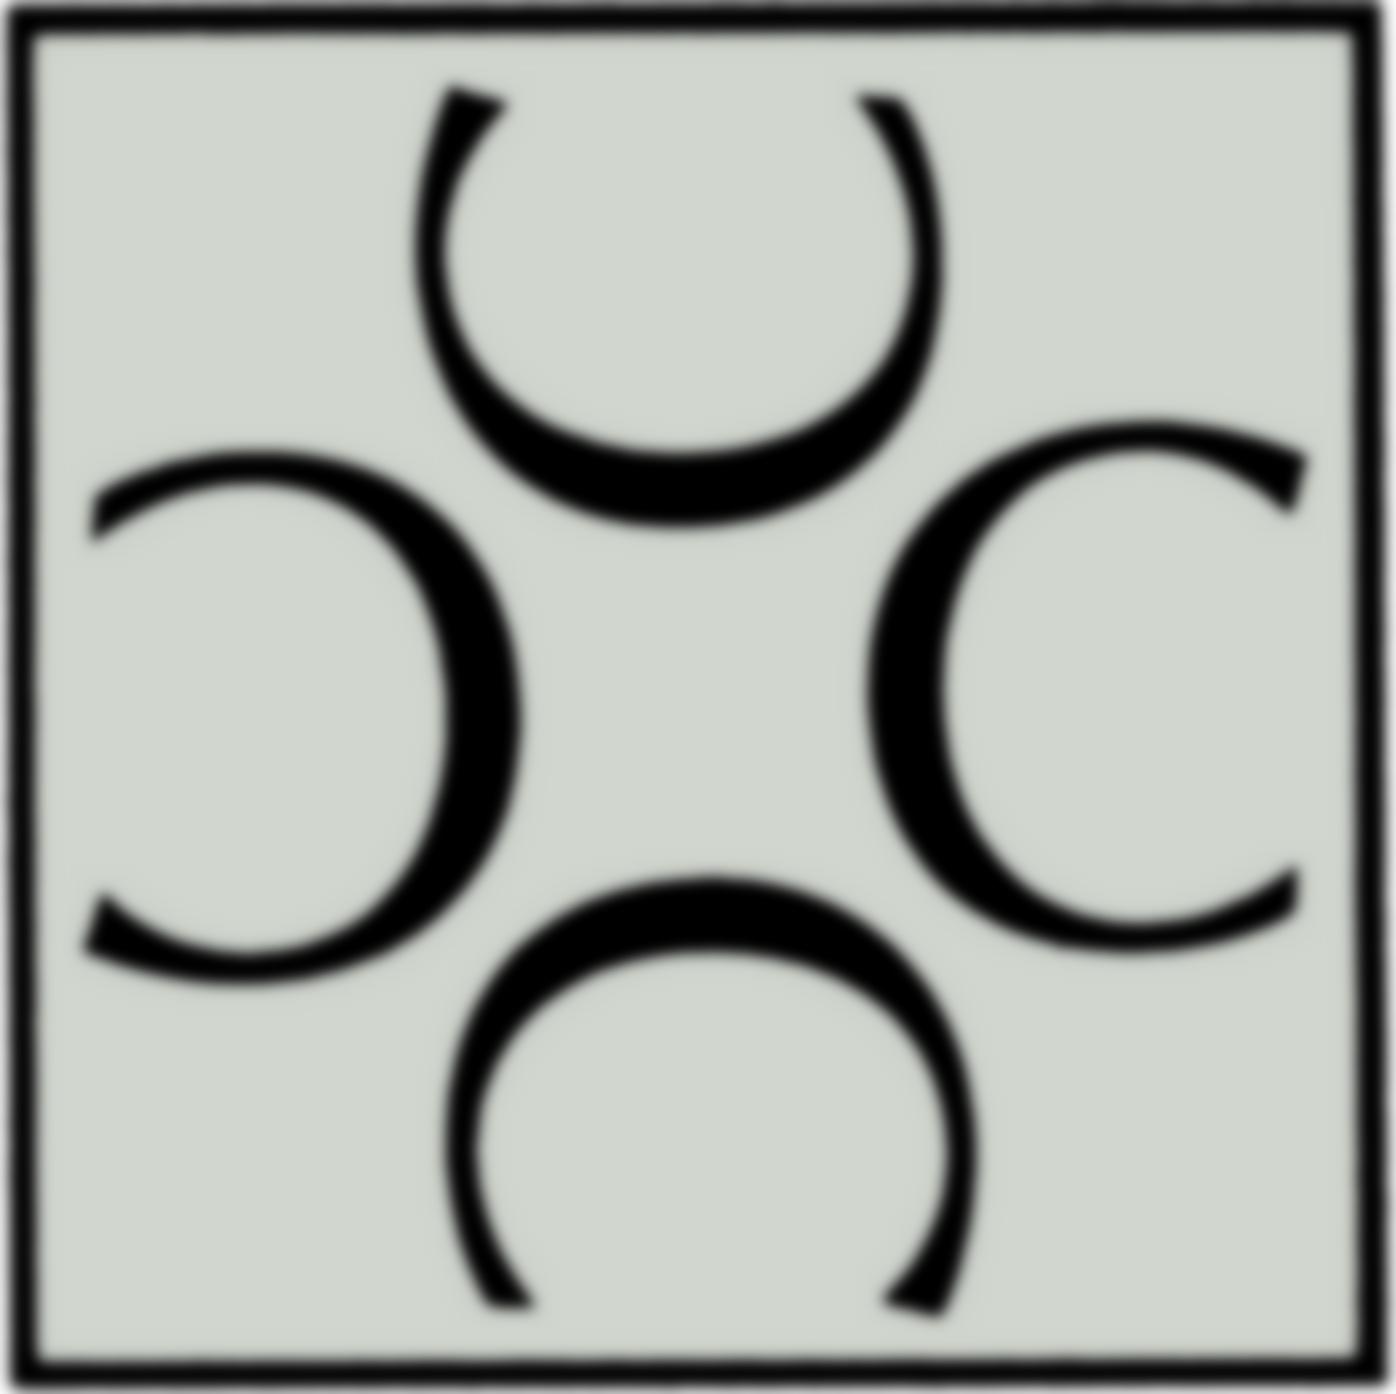 Výsledek obrázku pro crowood press logo